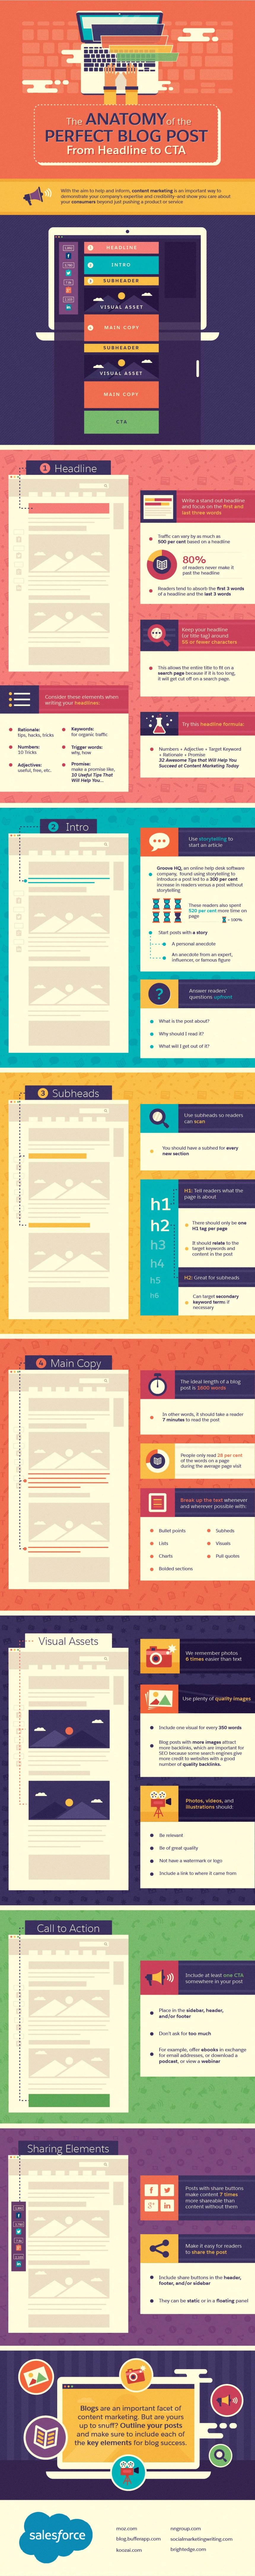 Anatomy of a Blog Post